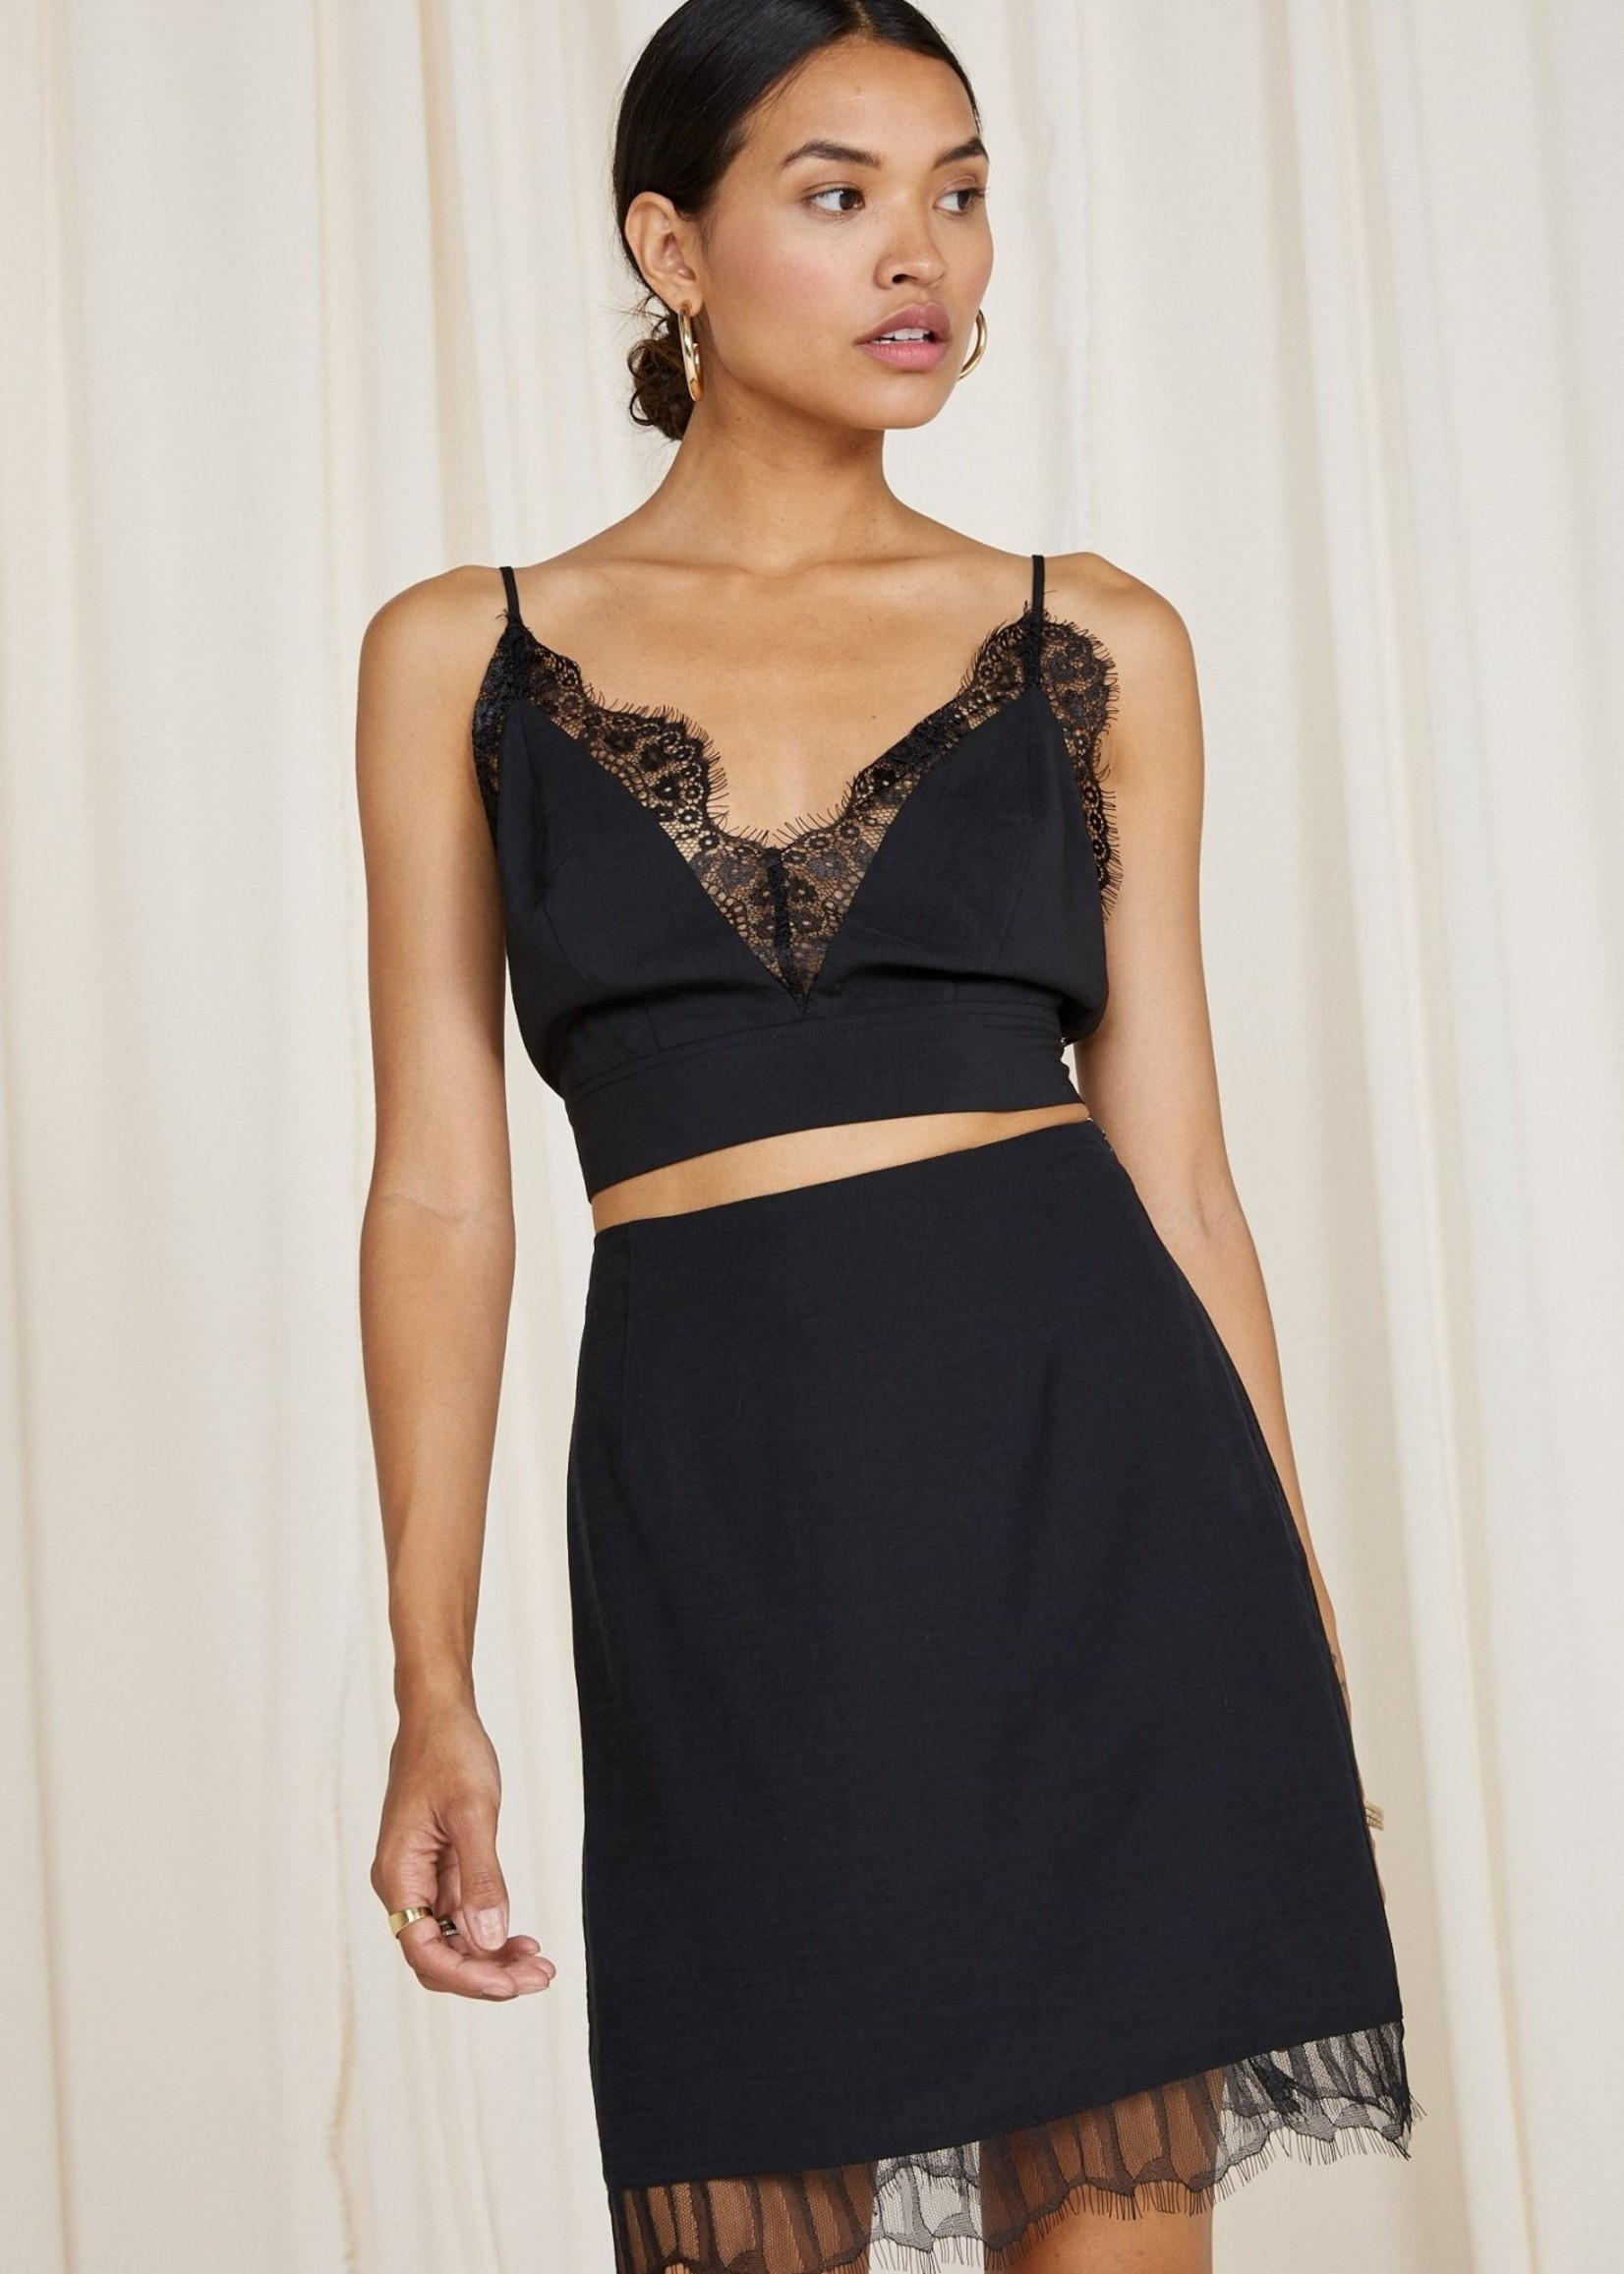 SAGE the LABEL GENESIS Lace Trim Skirt